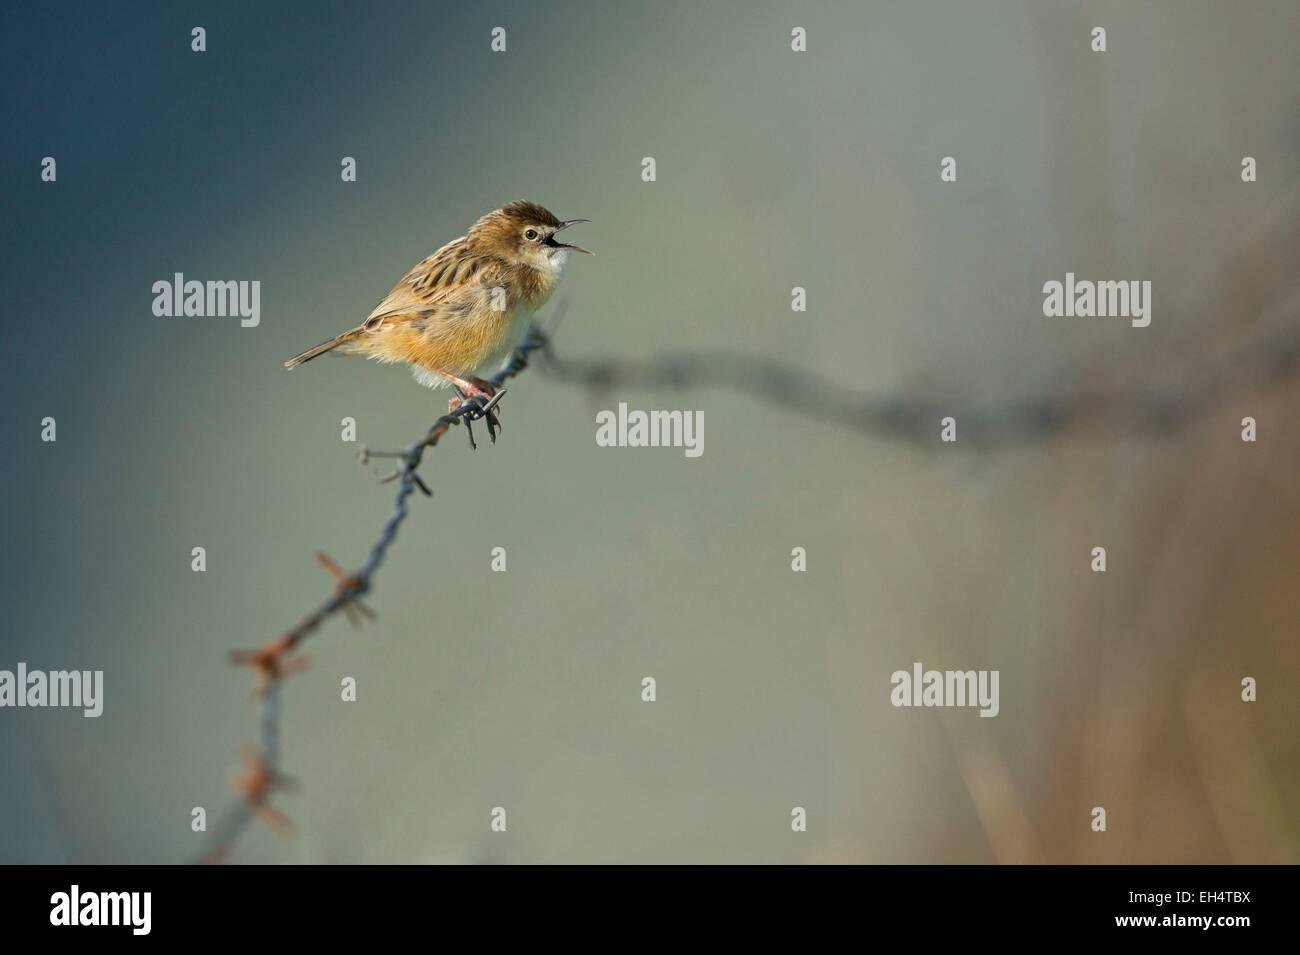 France, Vendee, La Barre de Monts, Cisticole rushes, (Cisticola juncidis) sings - Stock Image